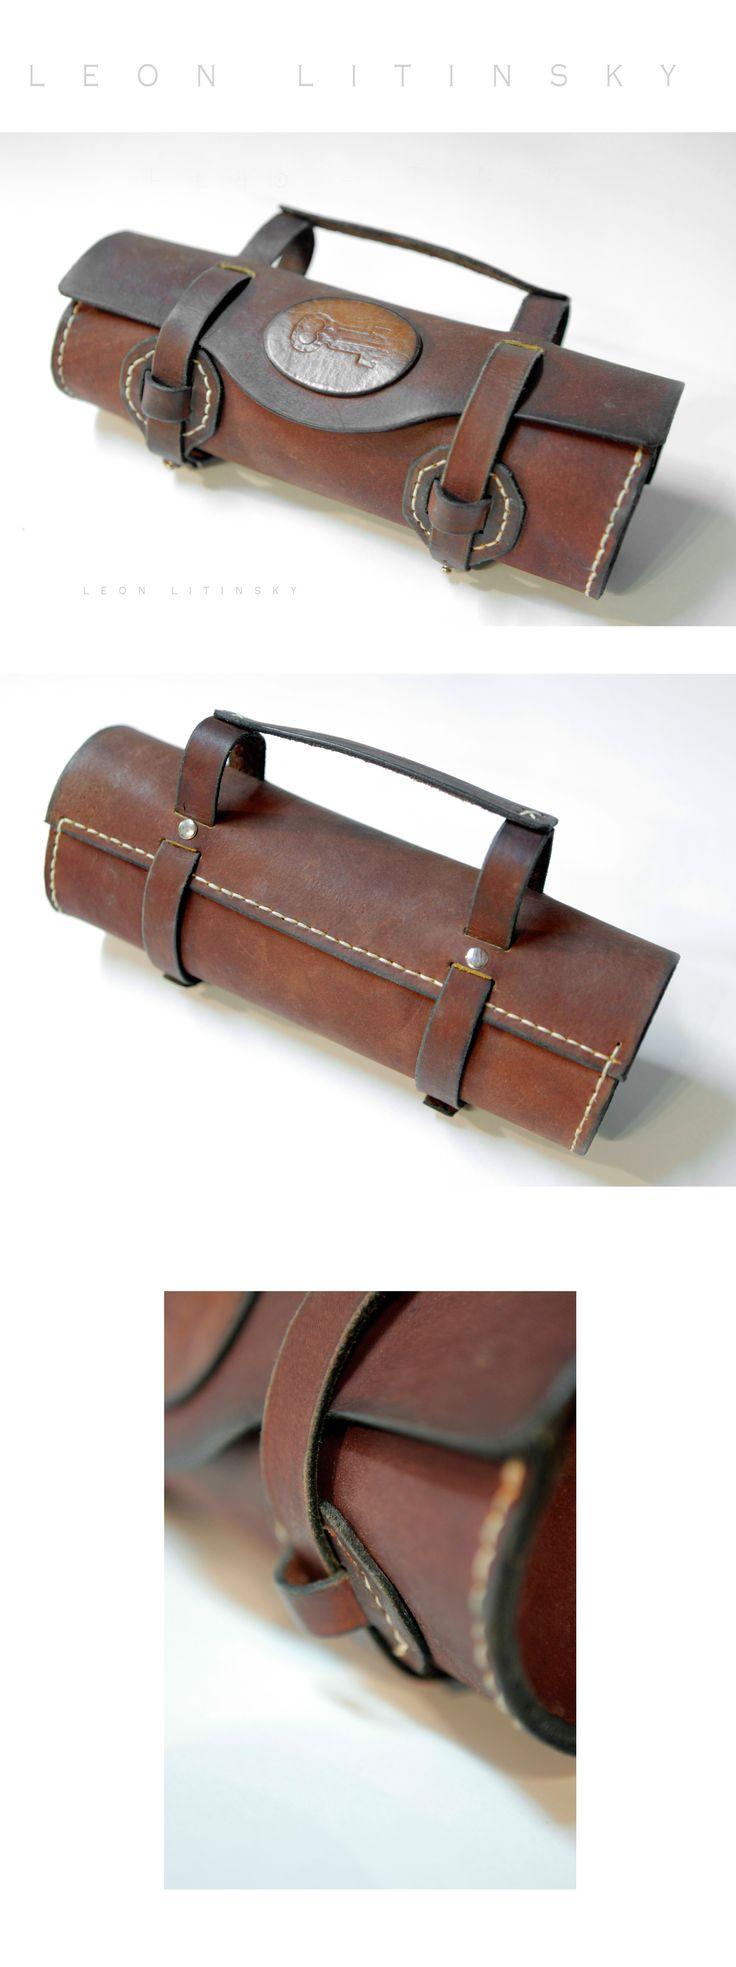 Bicycle Bag by Leon Litinsky.